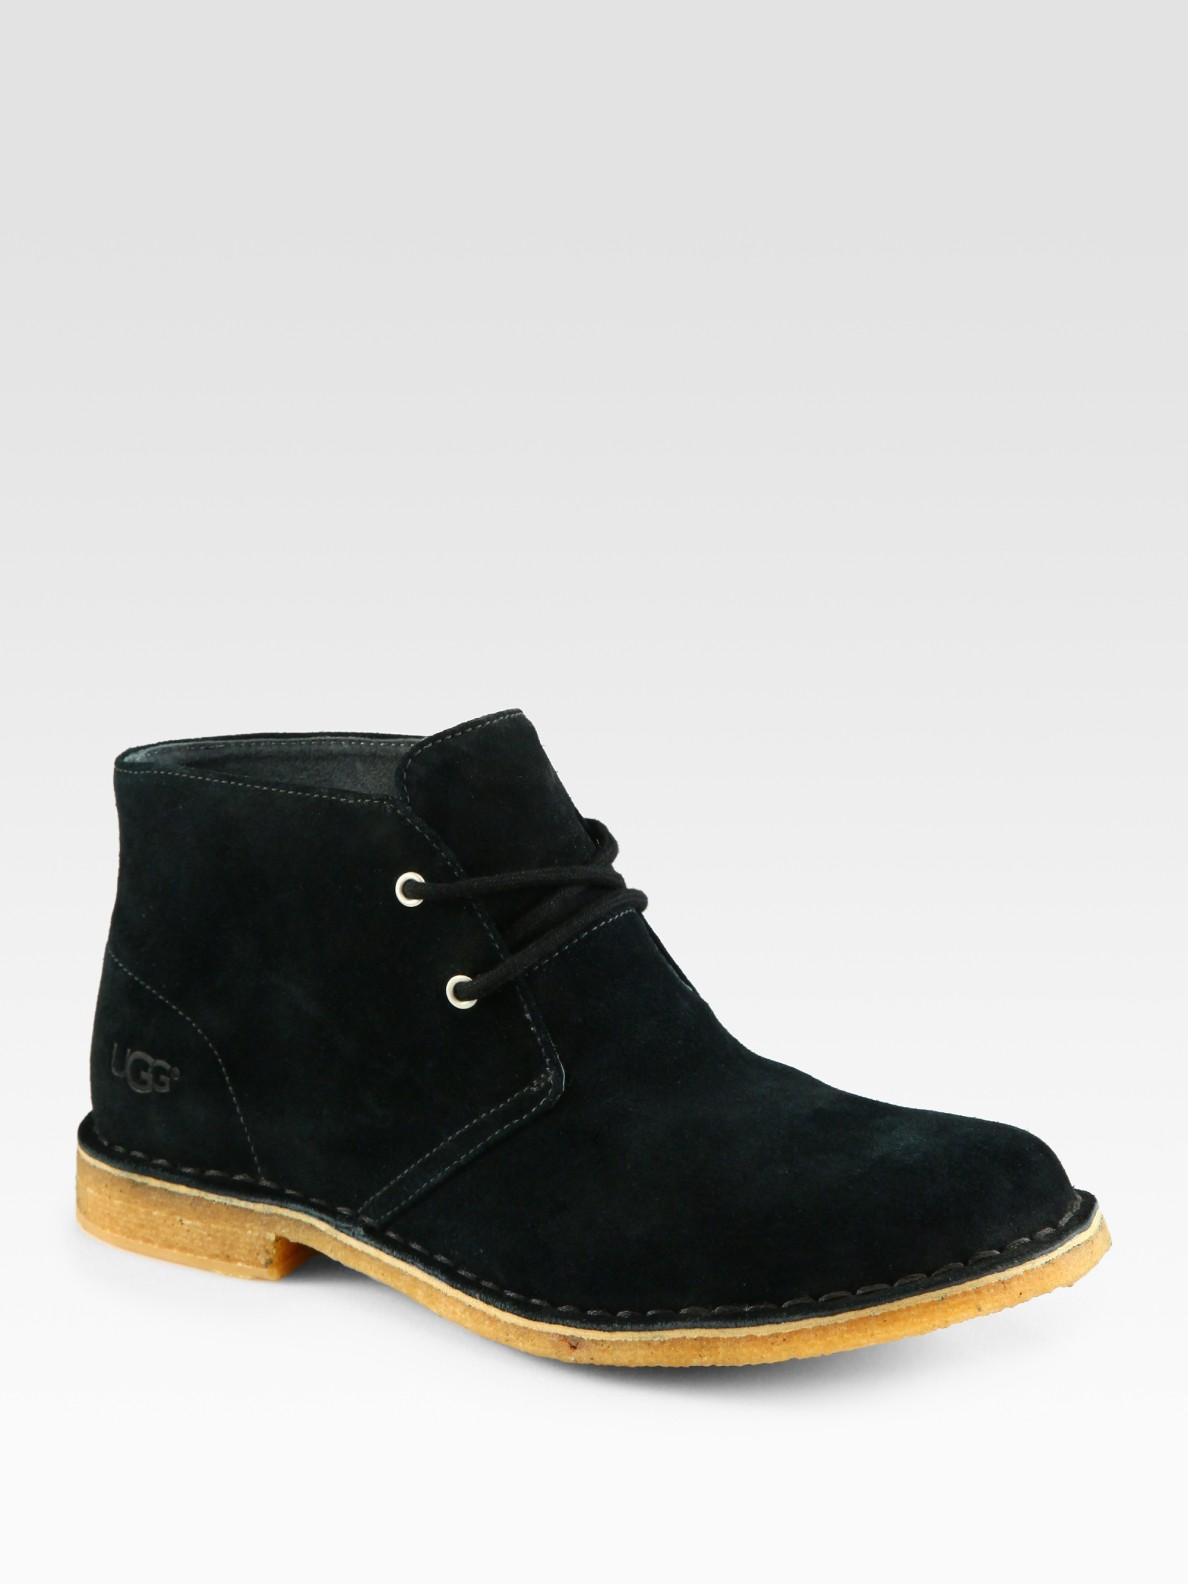 ugg leighton chukka boot in black for lyst